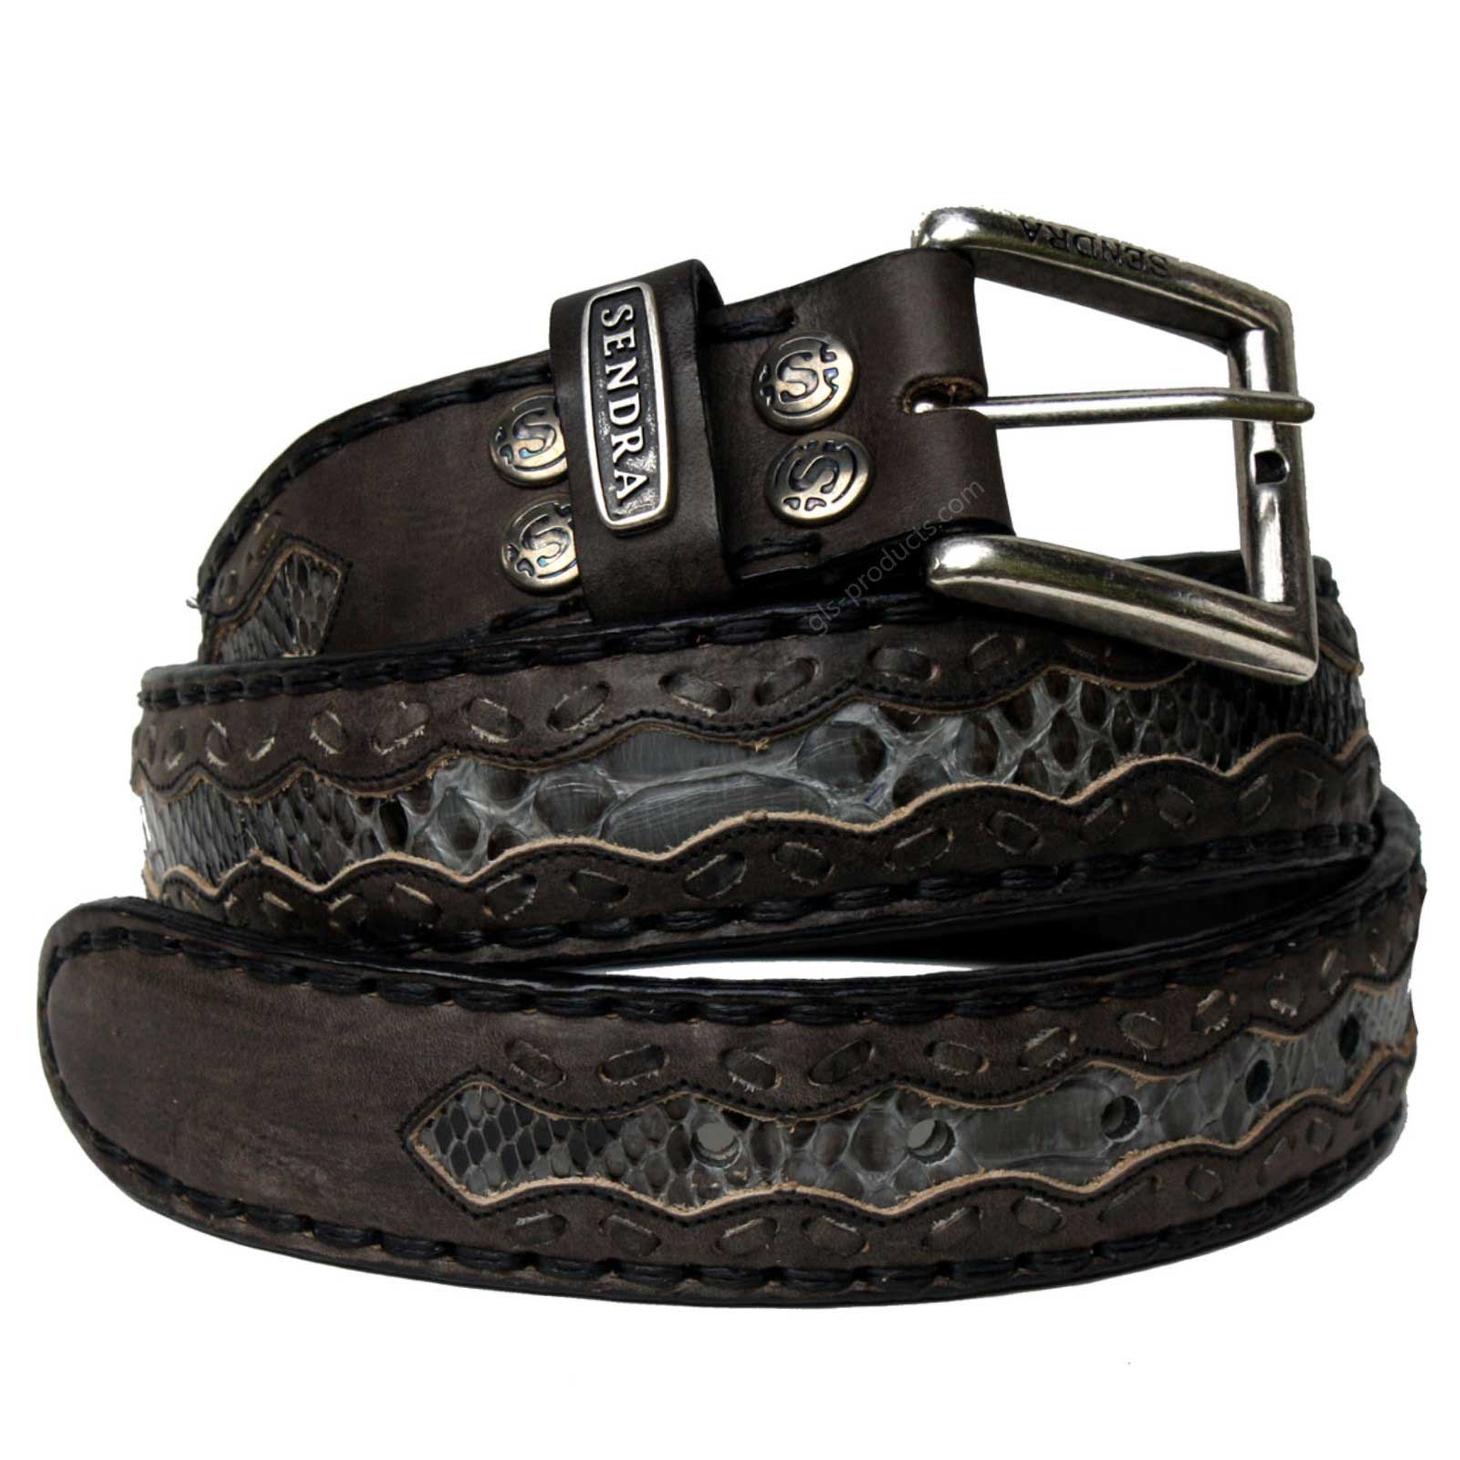 Sendra Leather Belt 8347